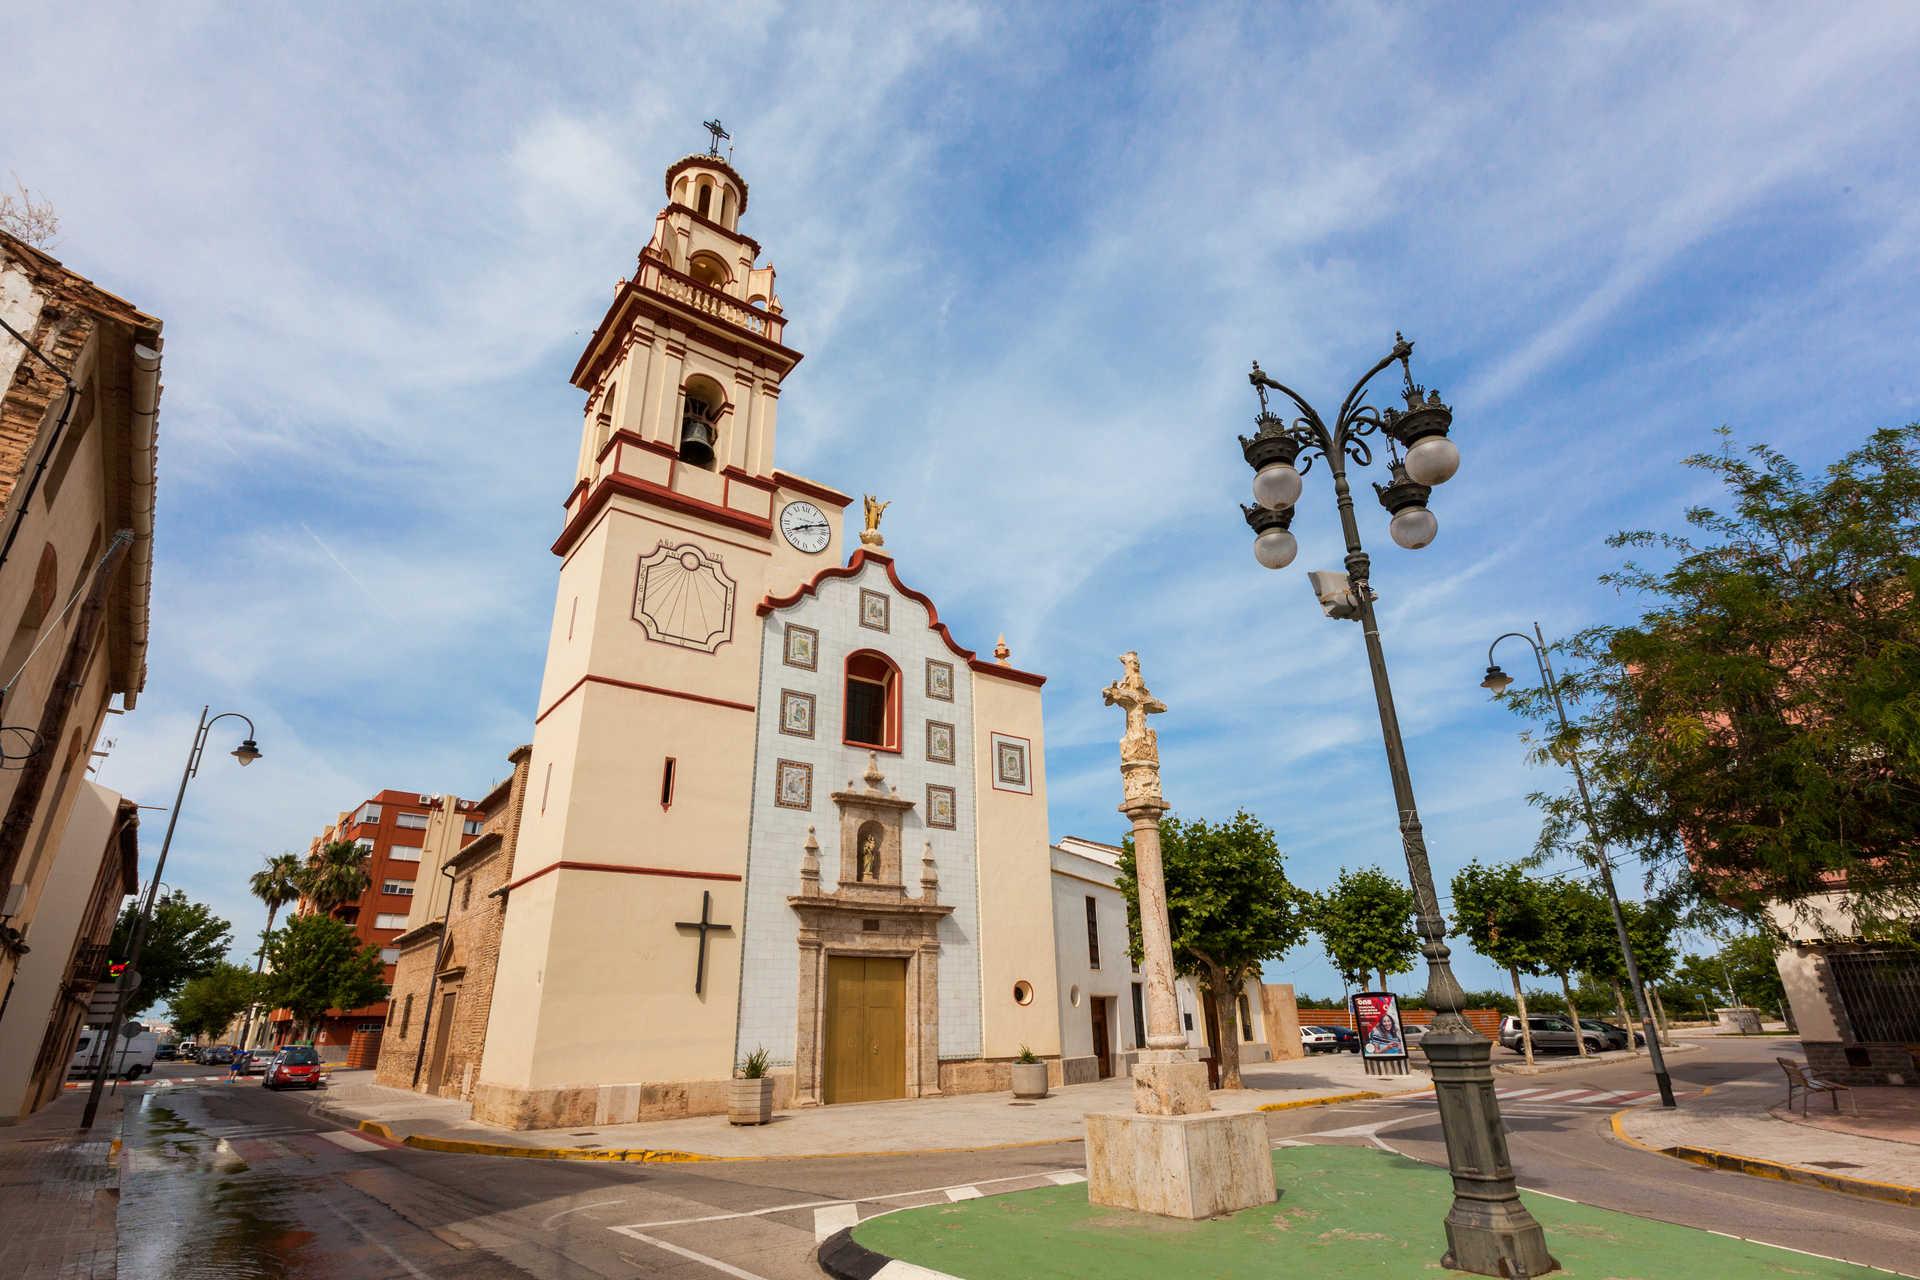 https://multimedia.comunitatvalenciana.com/263B502405FA4F248B50E3523BD17B98/img/D9B82EDA3FB54B2EA8AE586AA12376E3/Iglesia_San_Jose_MG_0038.jpg?responsive